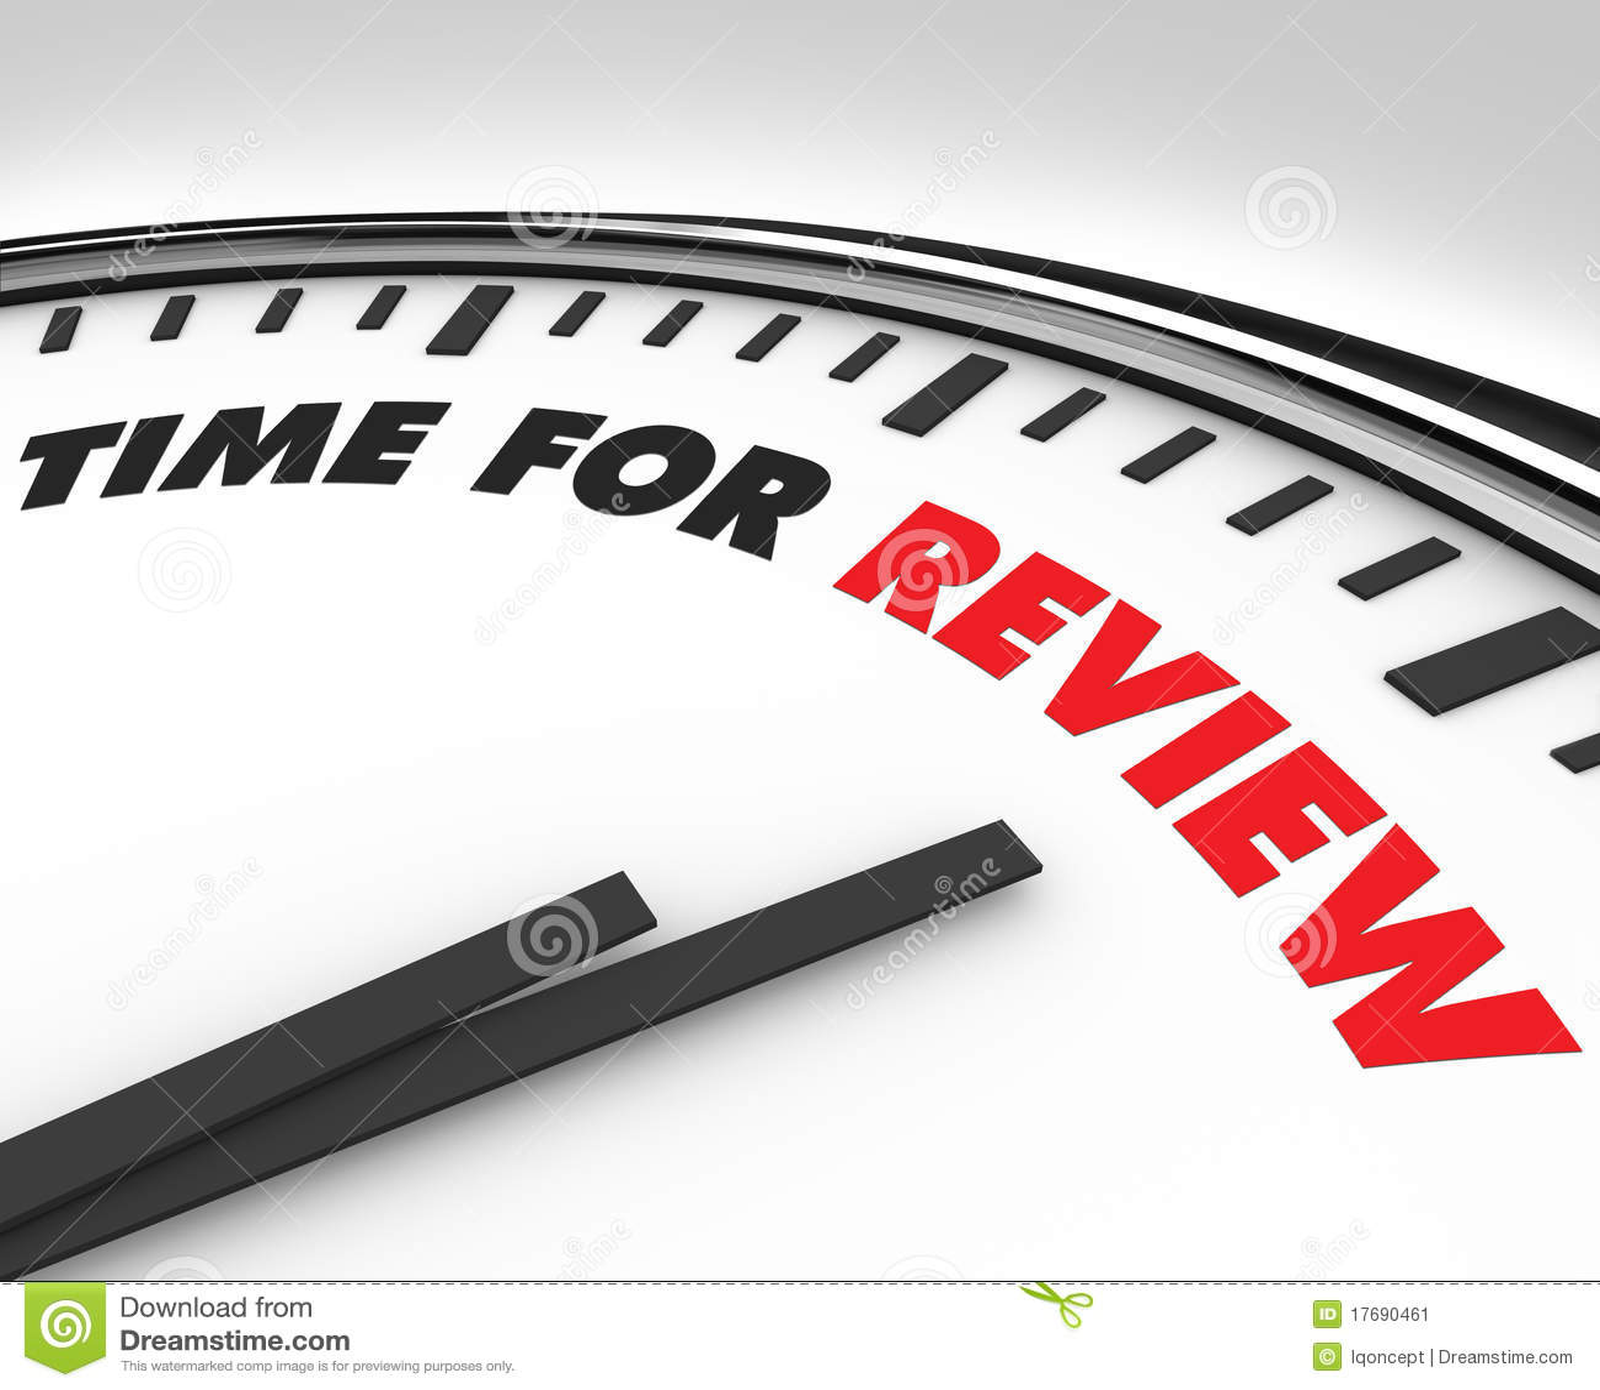 - Clock Time Illustration For Stock Review Illustration Of Grading 17690461